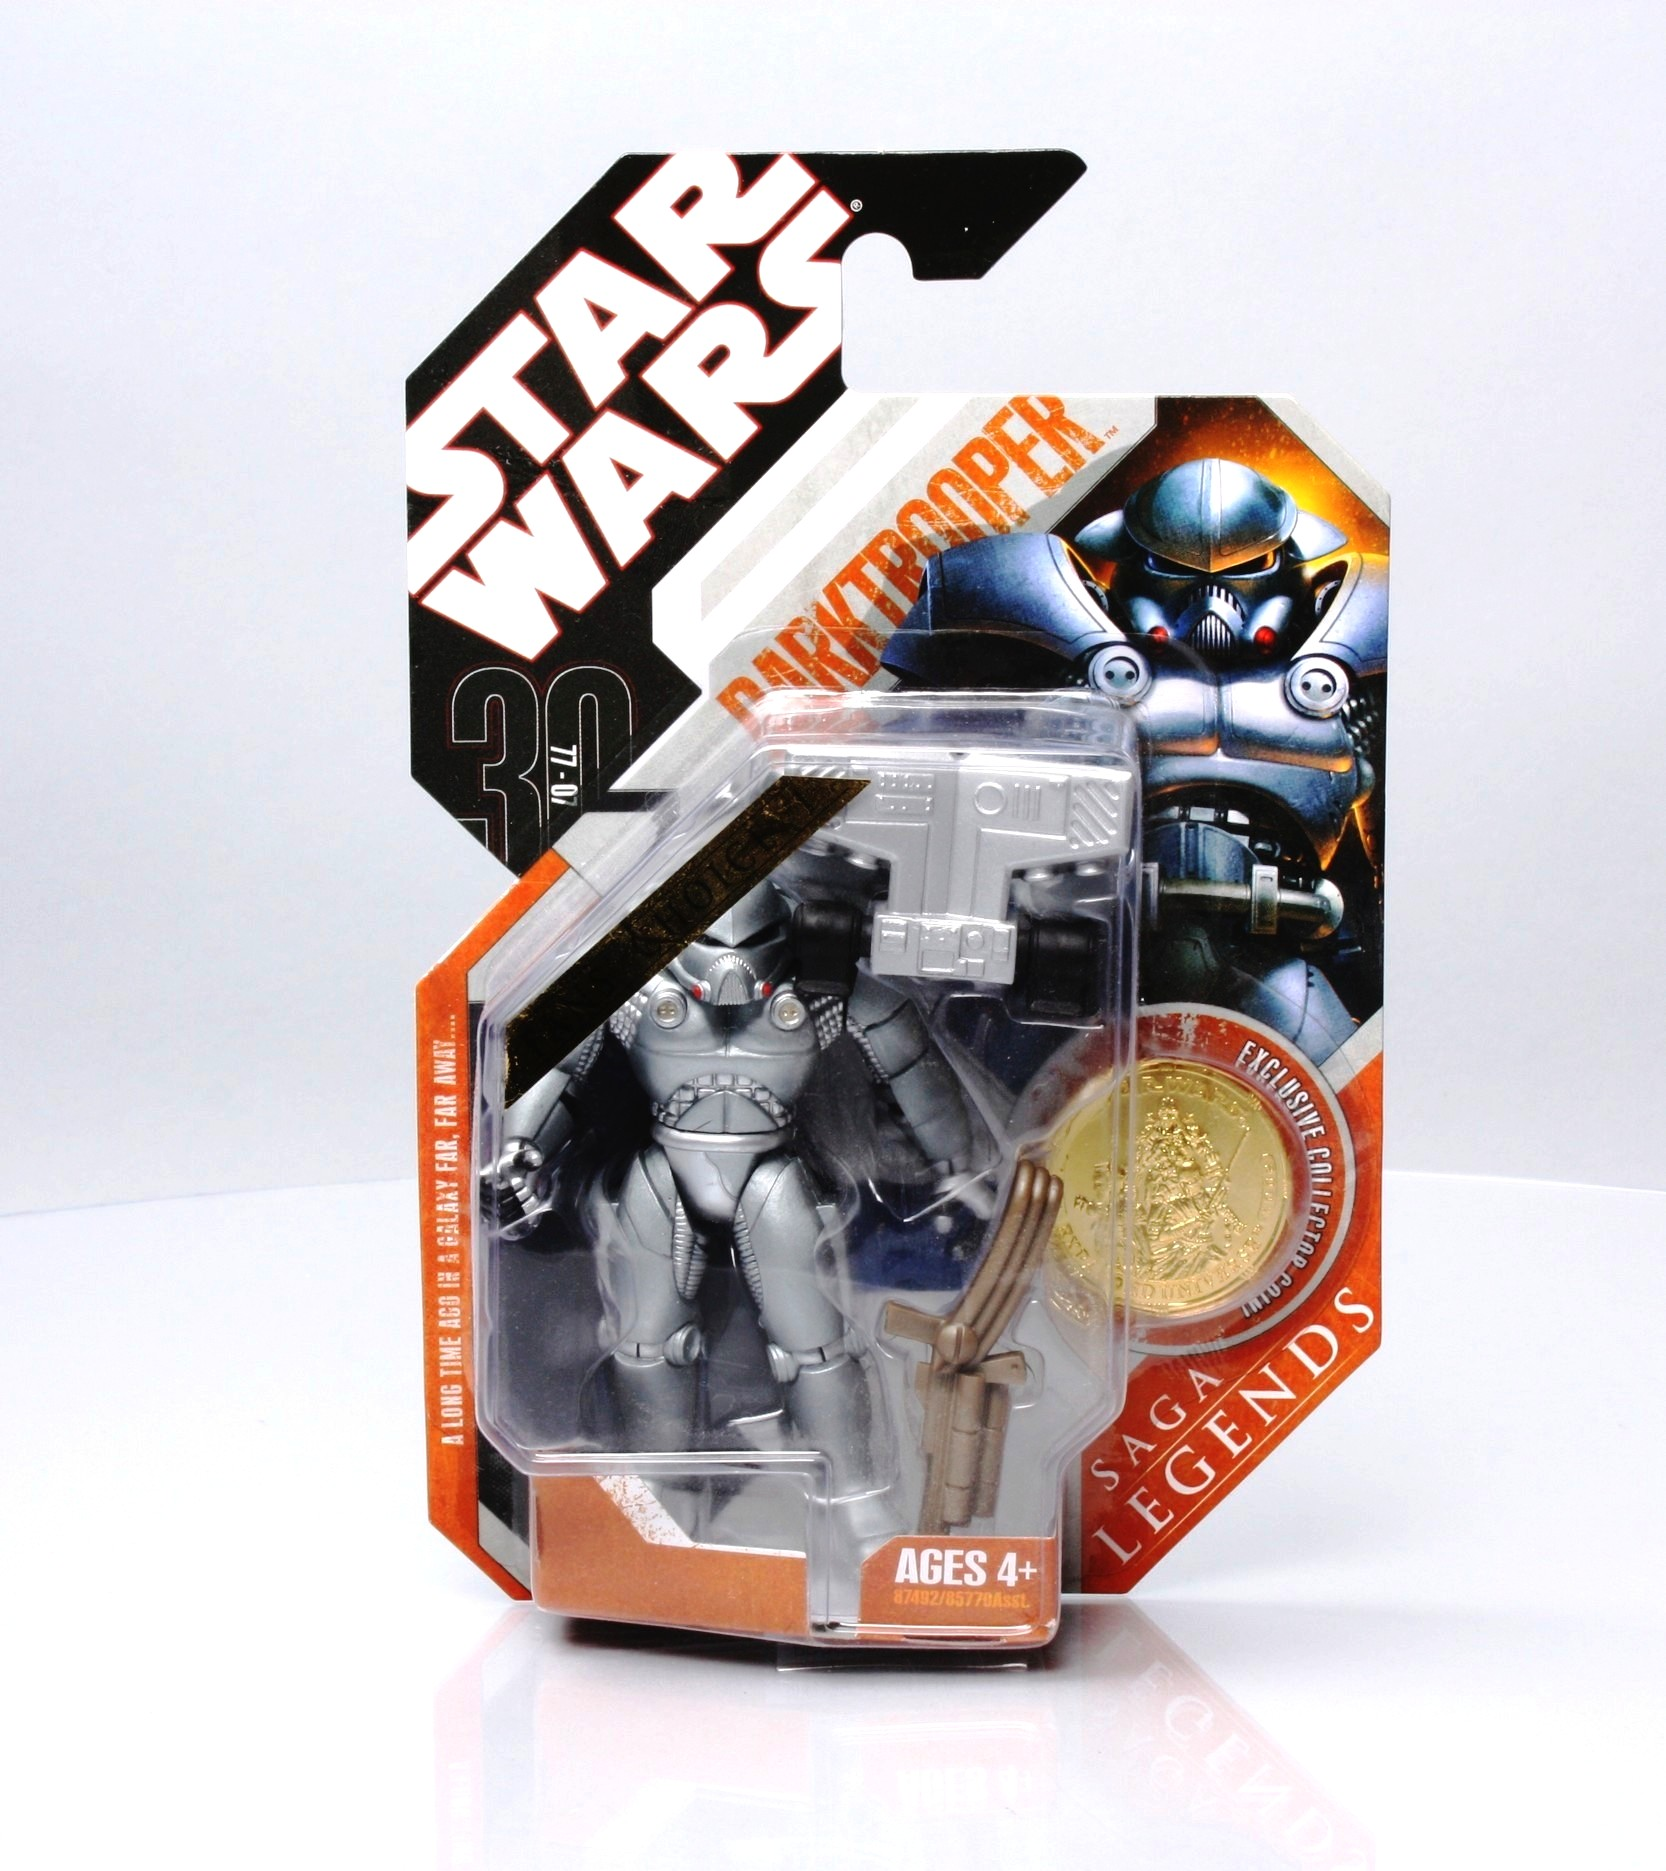 Star Wars Saga Legends Fan/'s Choice Darktrooper Figure with Gold Coin